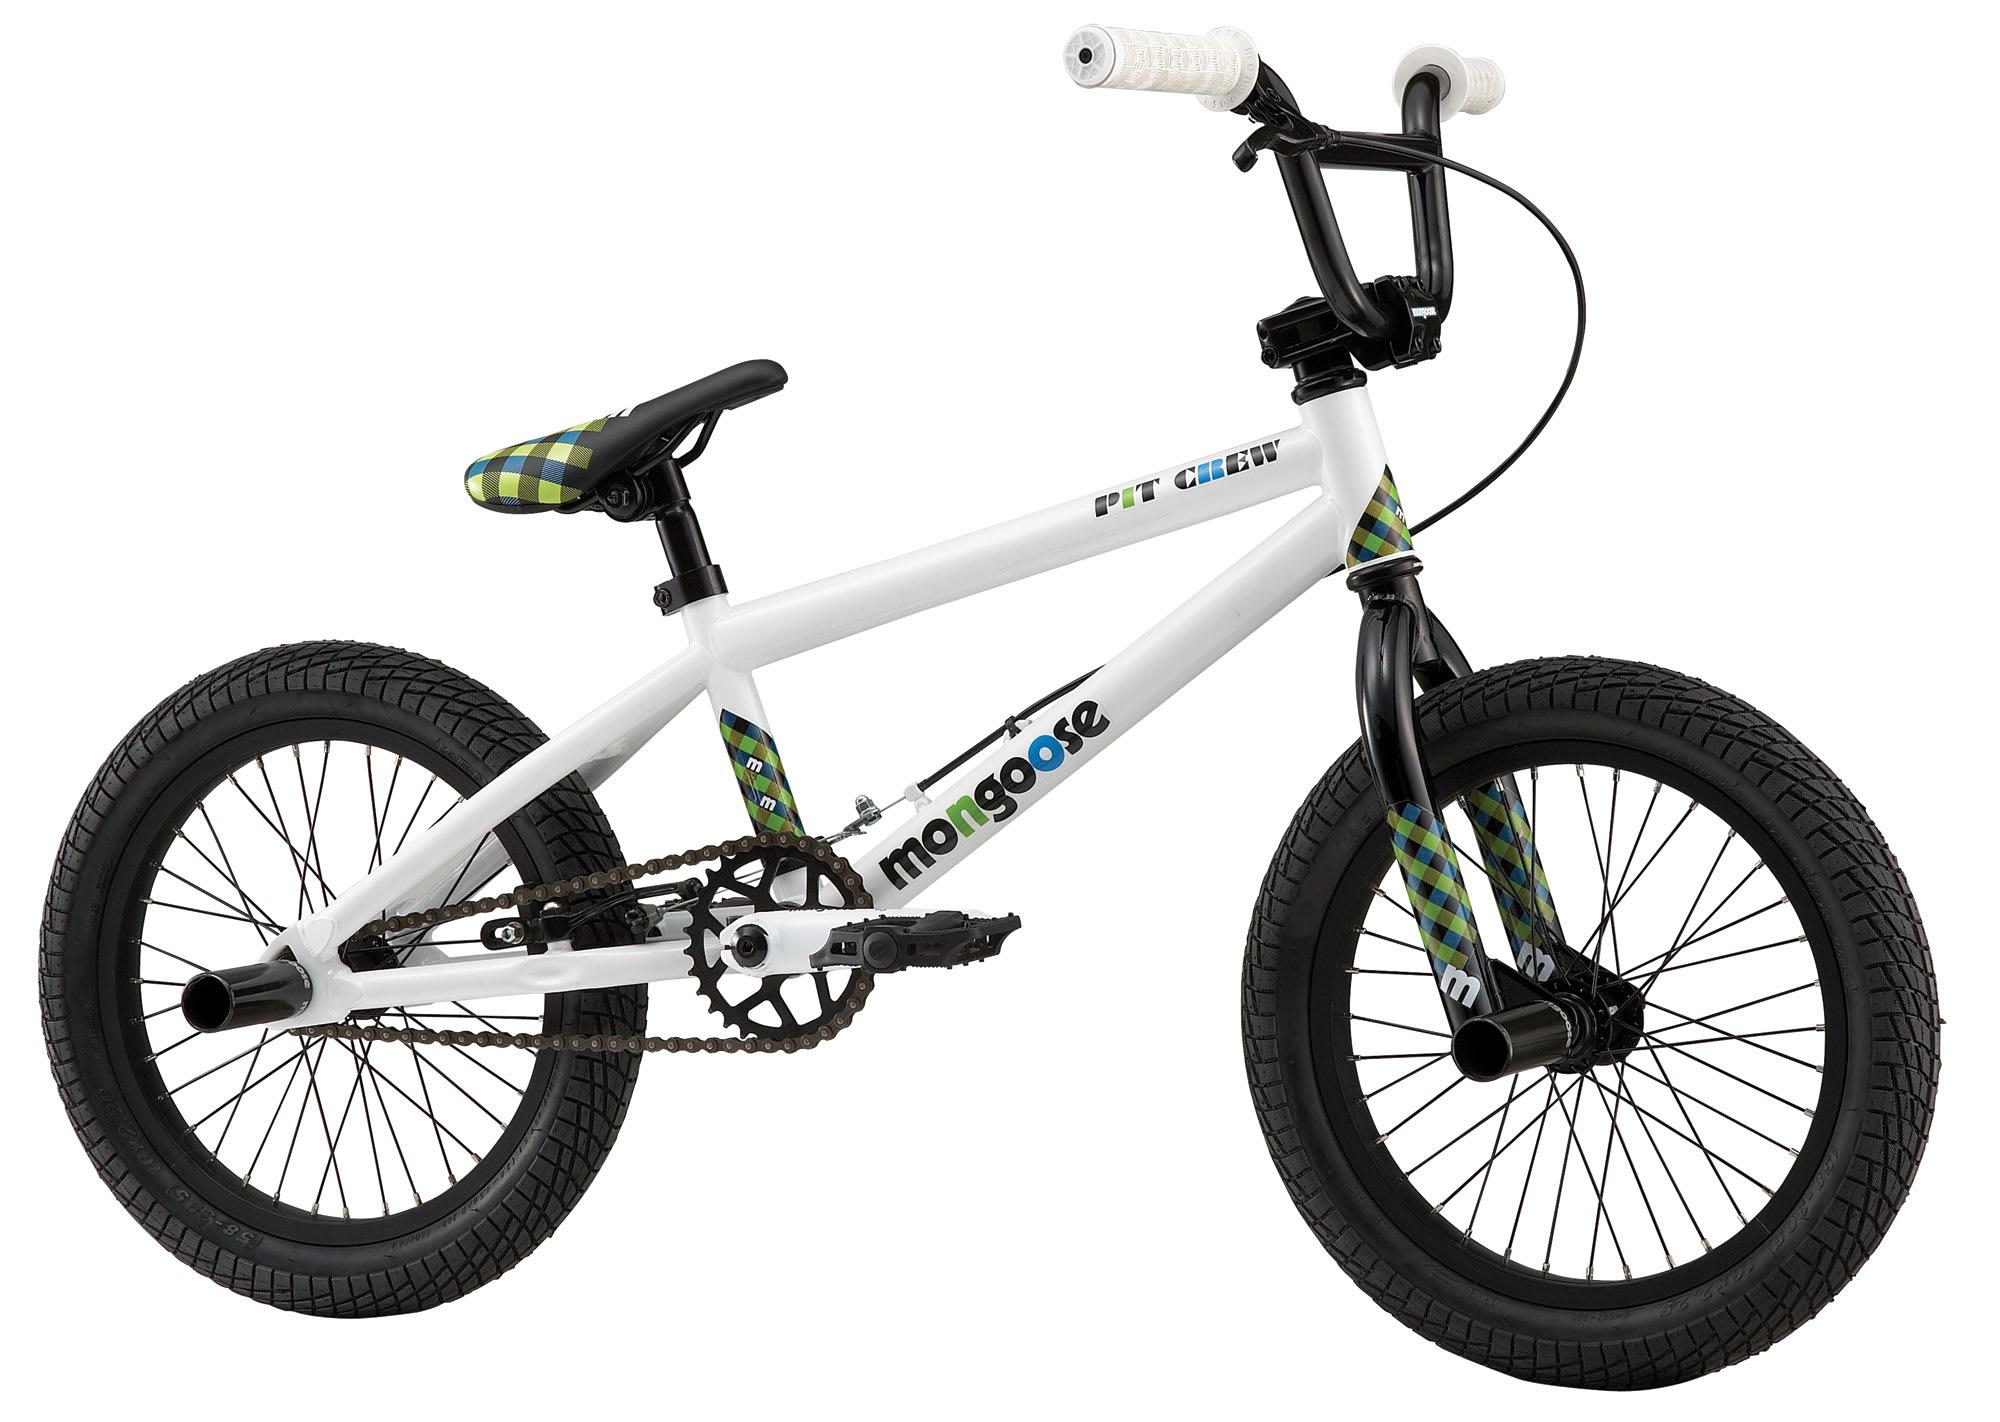 Bikes For Sale At Walmart Bikes And Sears BMX Bikes